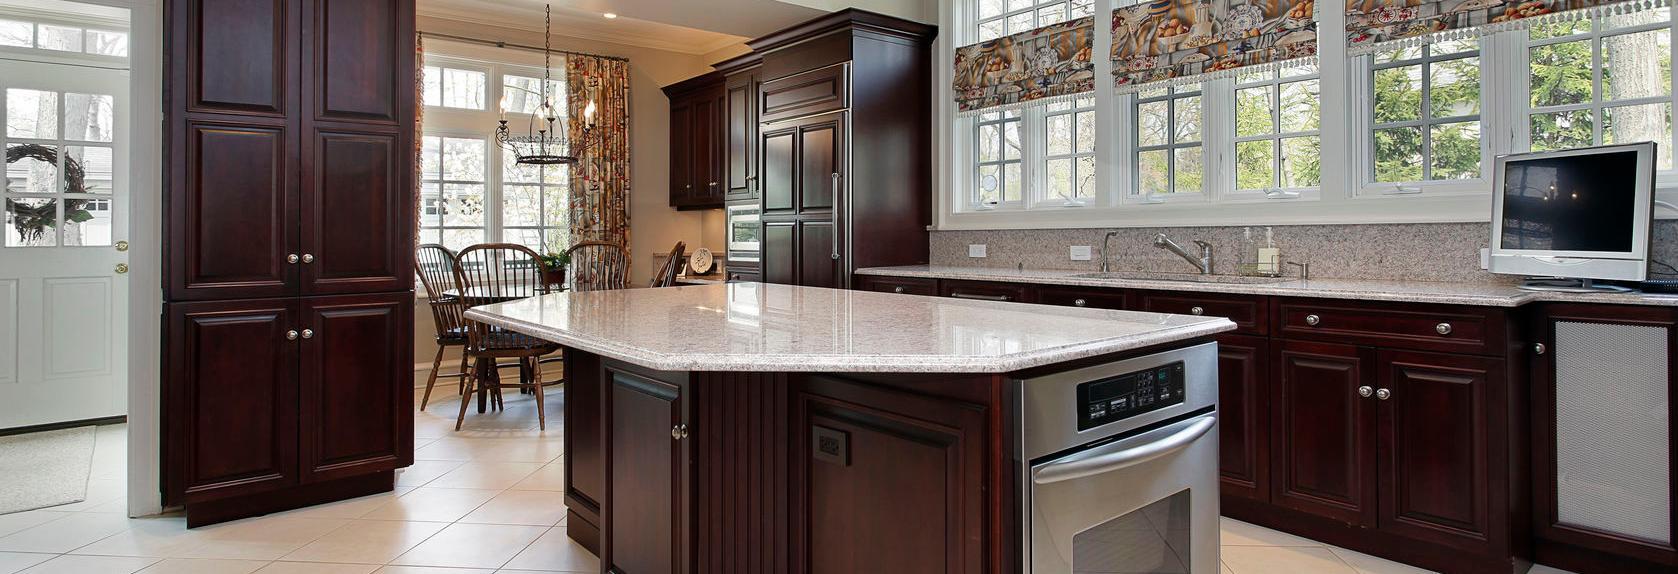 kitchen, basement, contractor, contracting, home repair, renovations